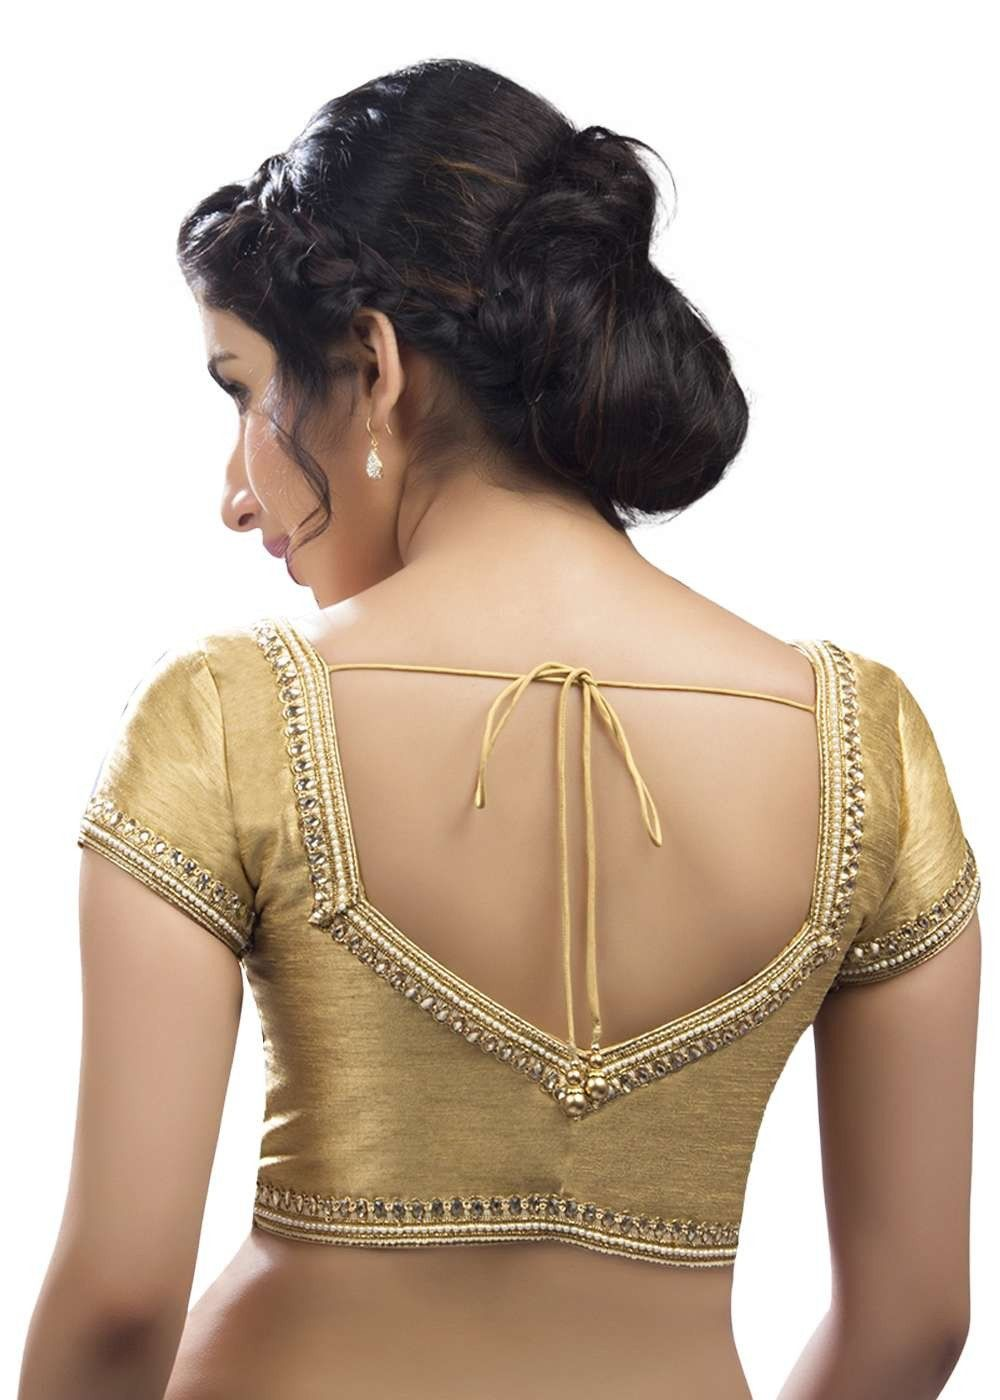 dcdd25faa06308 Ravishing Moti Laced Gold Ready-made Saree Blouse SNT-X-234-SL ...